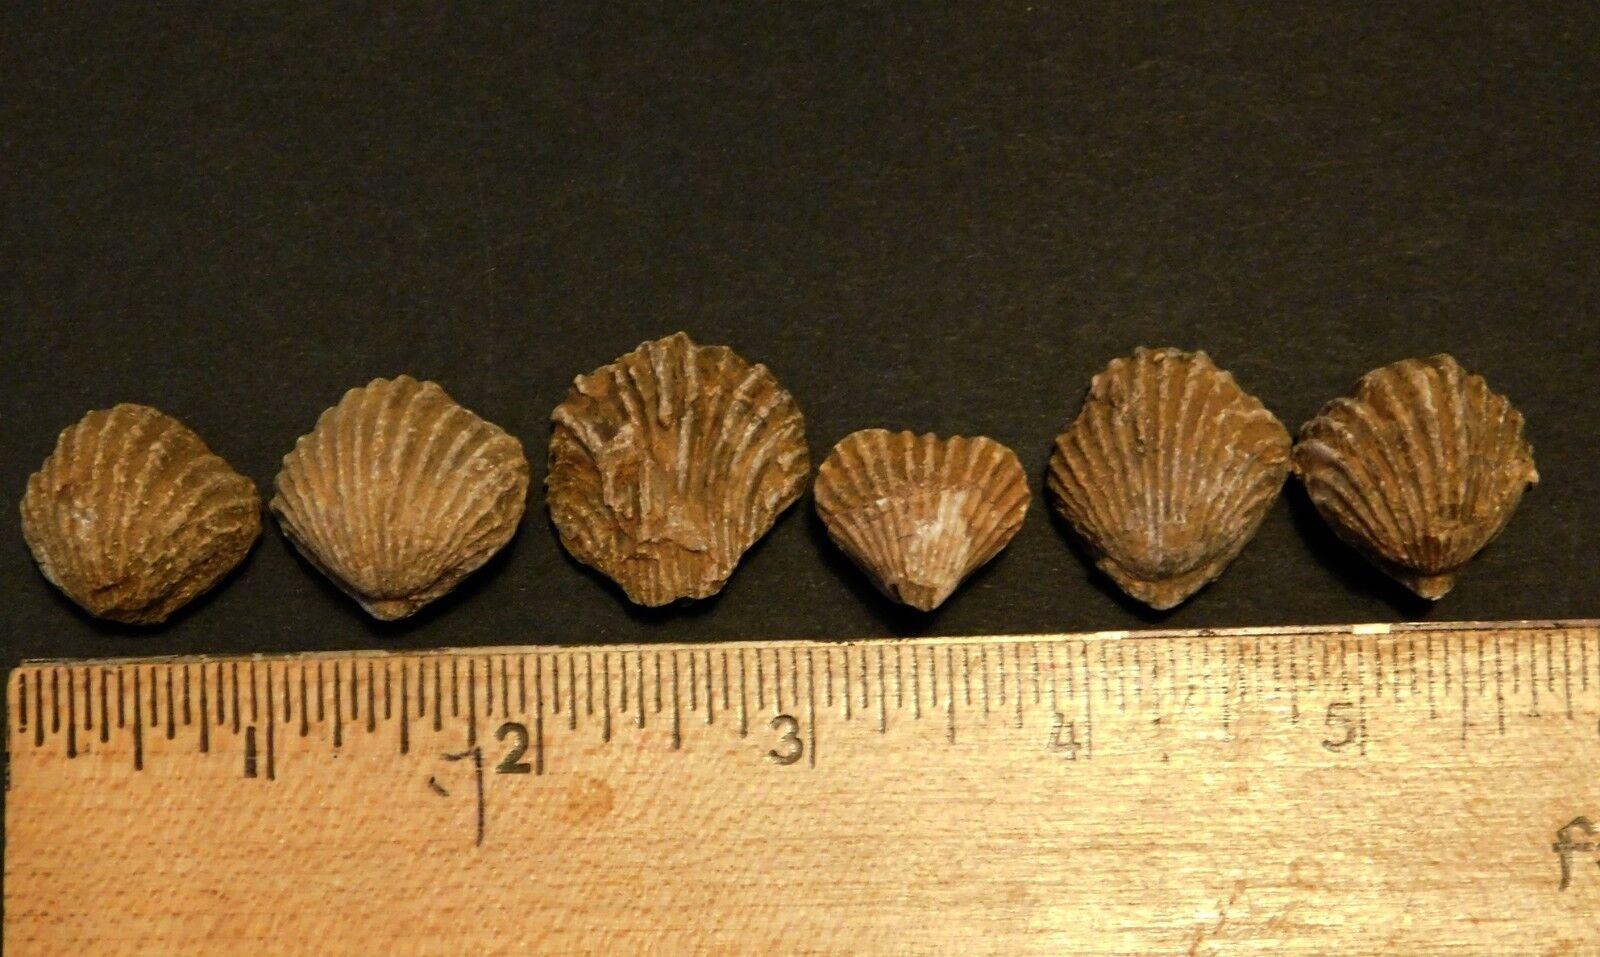 an analysis of brachiopod prominent shell fish Brachiopod shells, fossils of kentucky, kentucky geological survey.